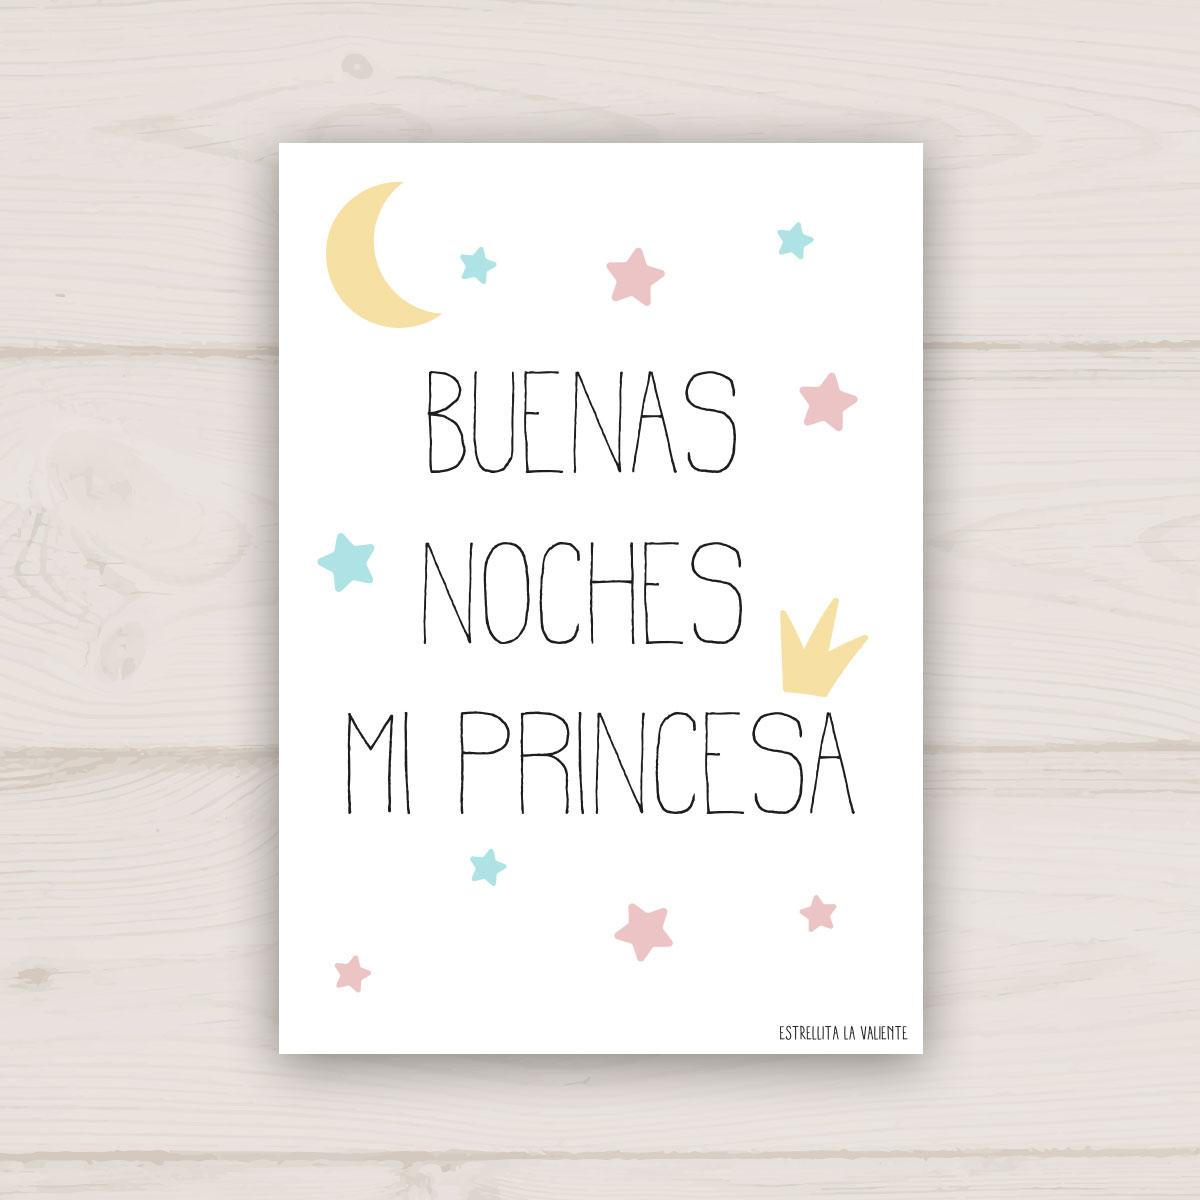 Lámina Buenas noches mi princesa